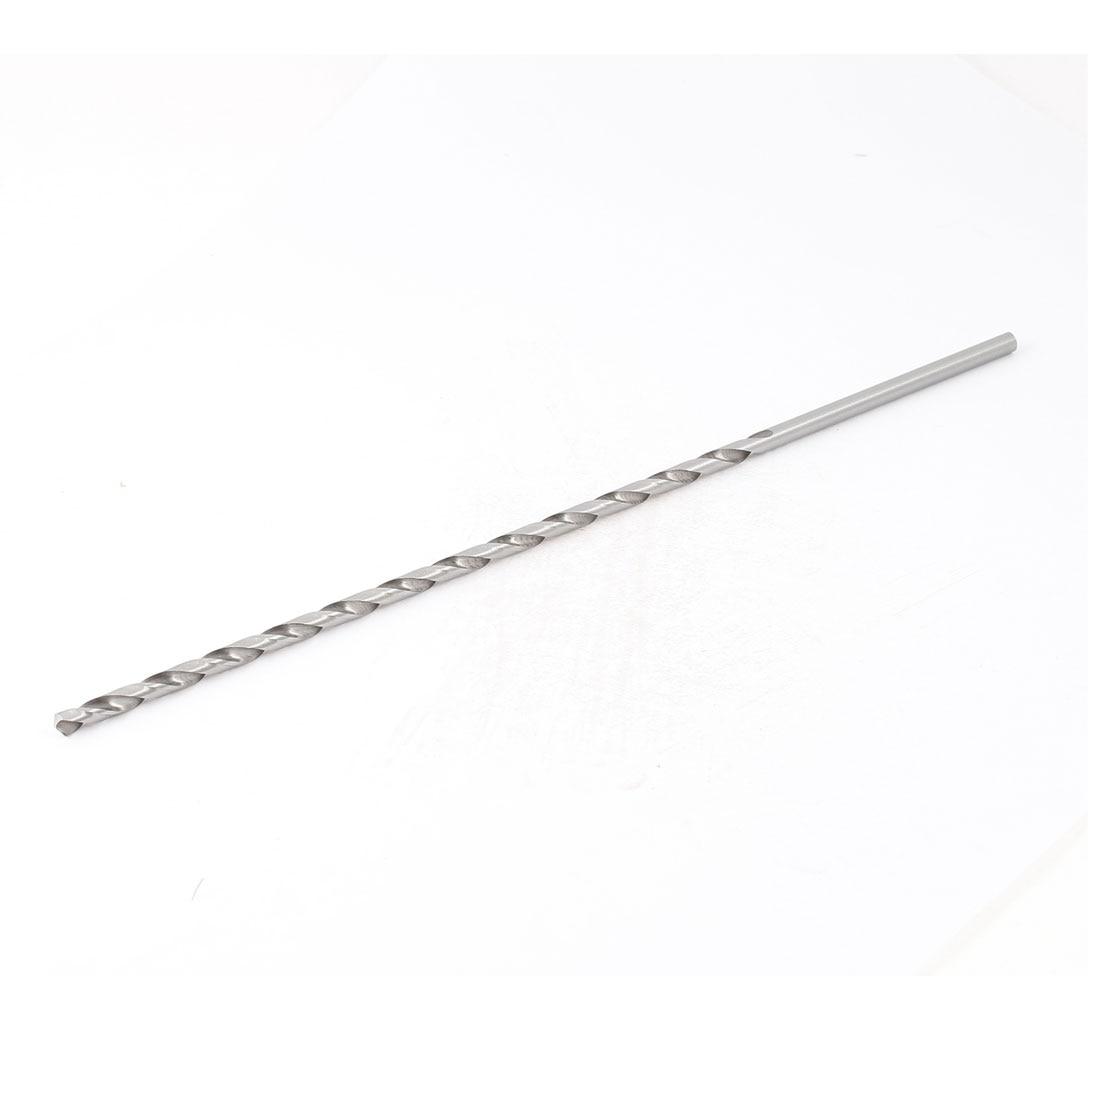 Подробнее о UXCELL 5Mm X 250Mm Straight Shank Twist Drilling Bit For Electric Drill bit | drill | twist uxcell 17mm shank 270mm length electric pick hexagon flat spade for makita 0810